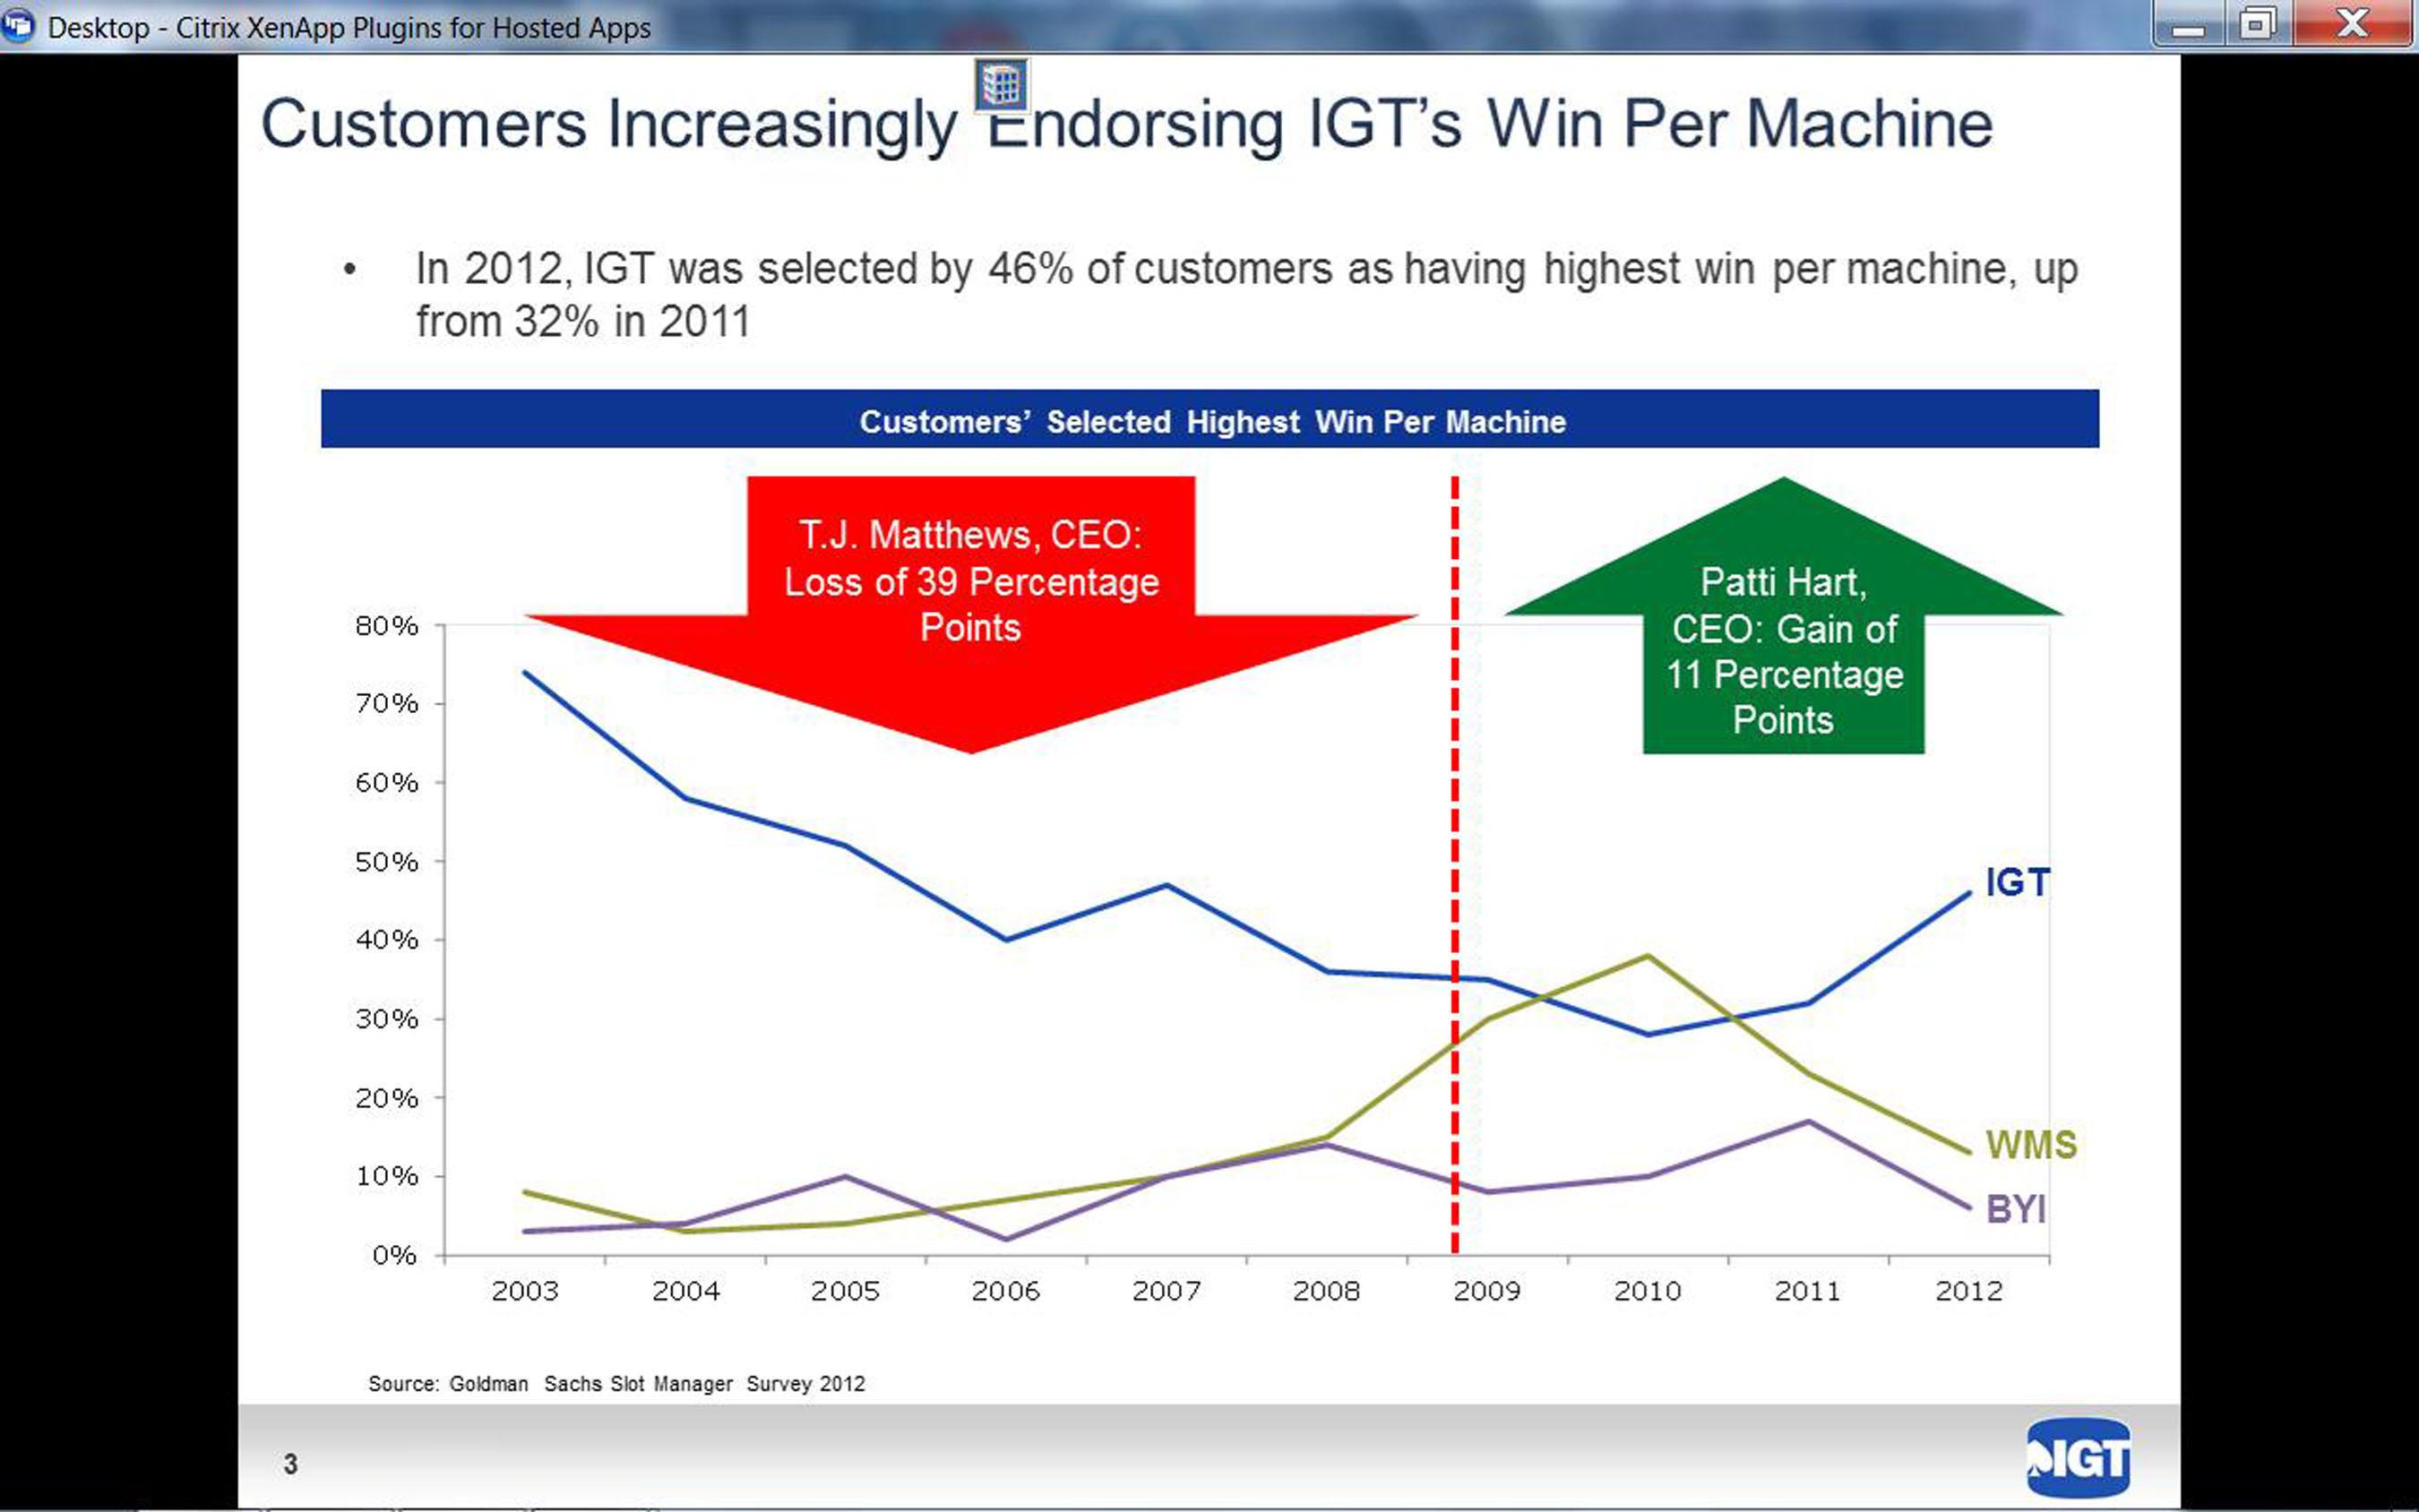 Customers Increasingly Endorsing IGT's Win Per Machine. (PRNewsFoto/International Game Technology) (PRNewsFoto/INTERNATIONAL GAME TECHNOLOGY)